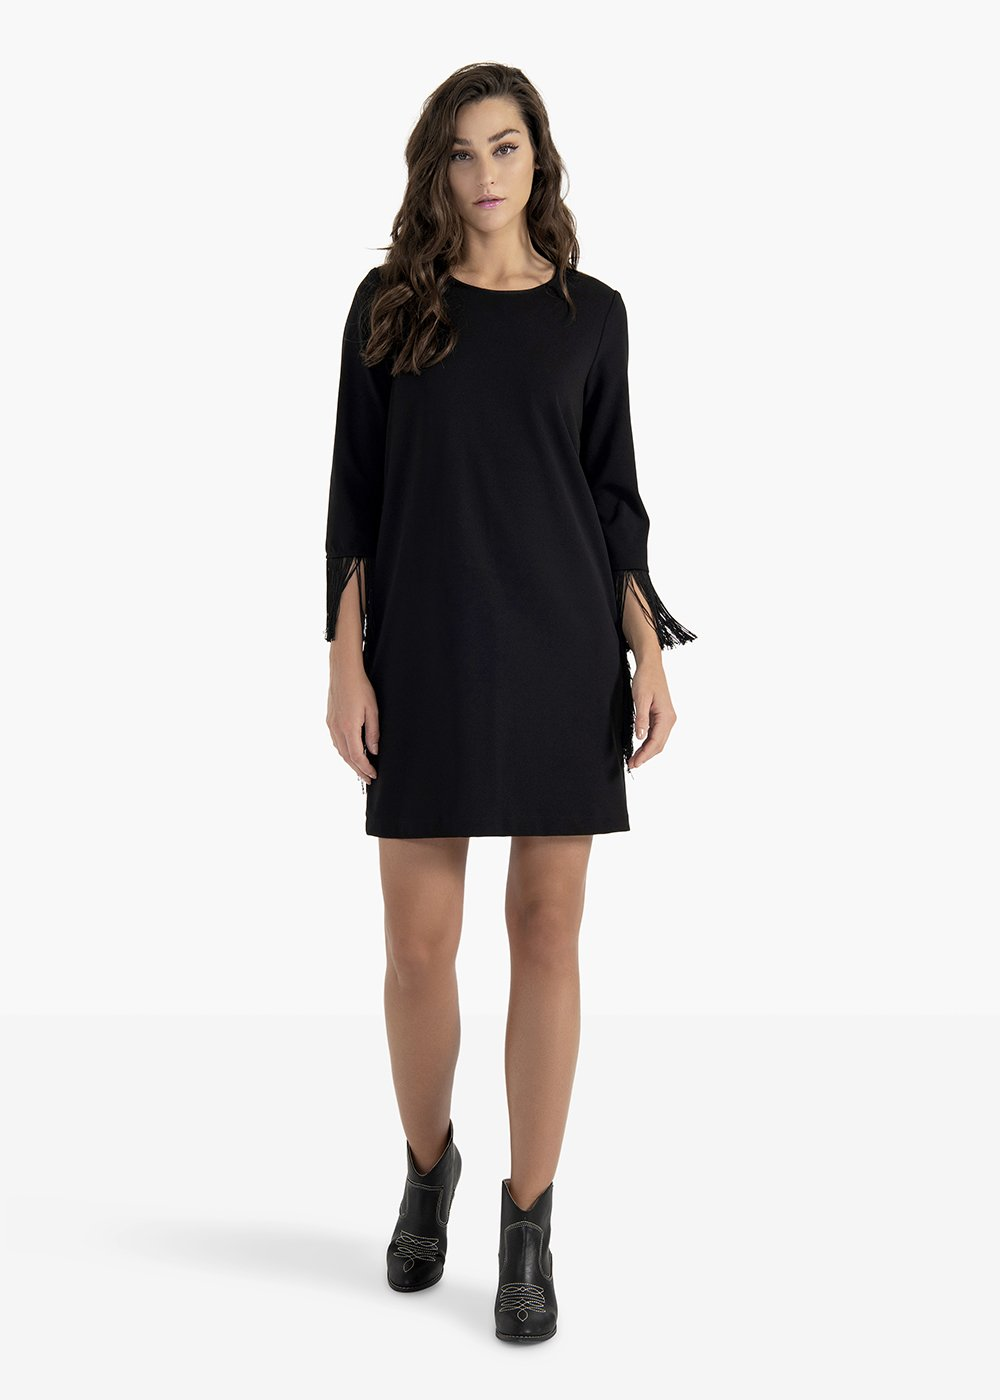 Artur crêpe dress with round neckline - Black - Woman